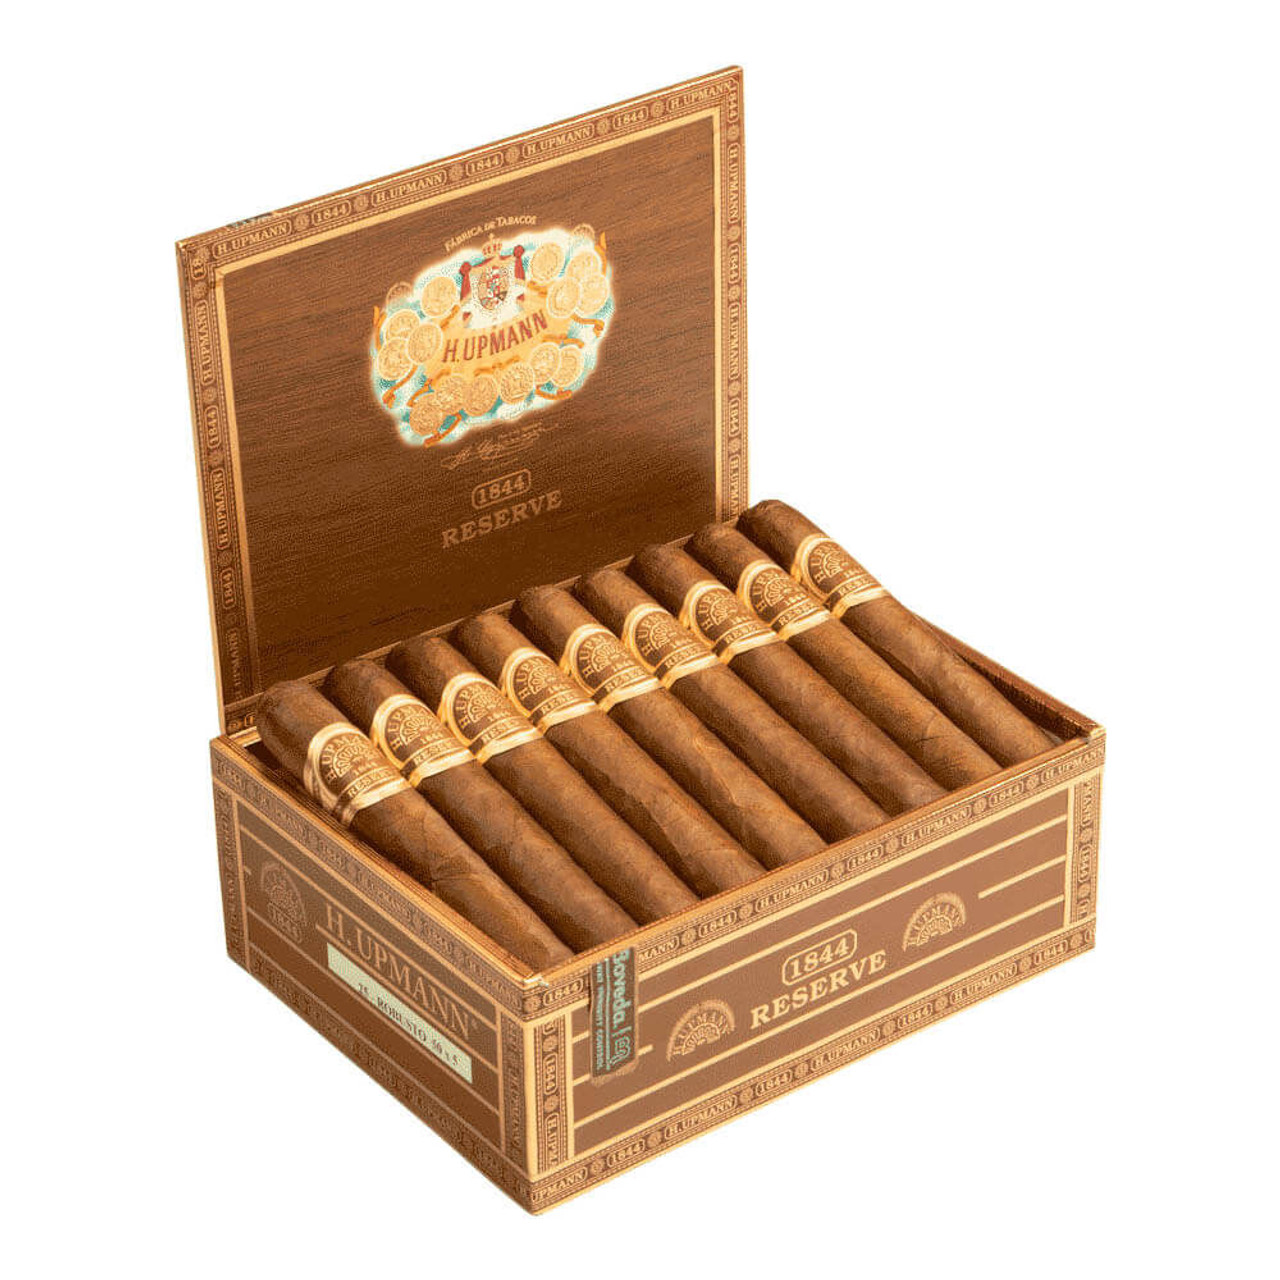 H. Upmann 1844 Reserve Robusto EMS Cigars - 5 x 50 (Box of 25)